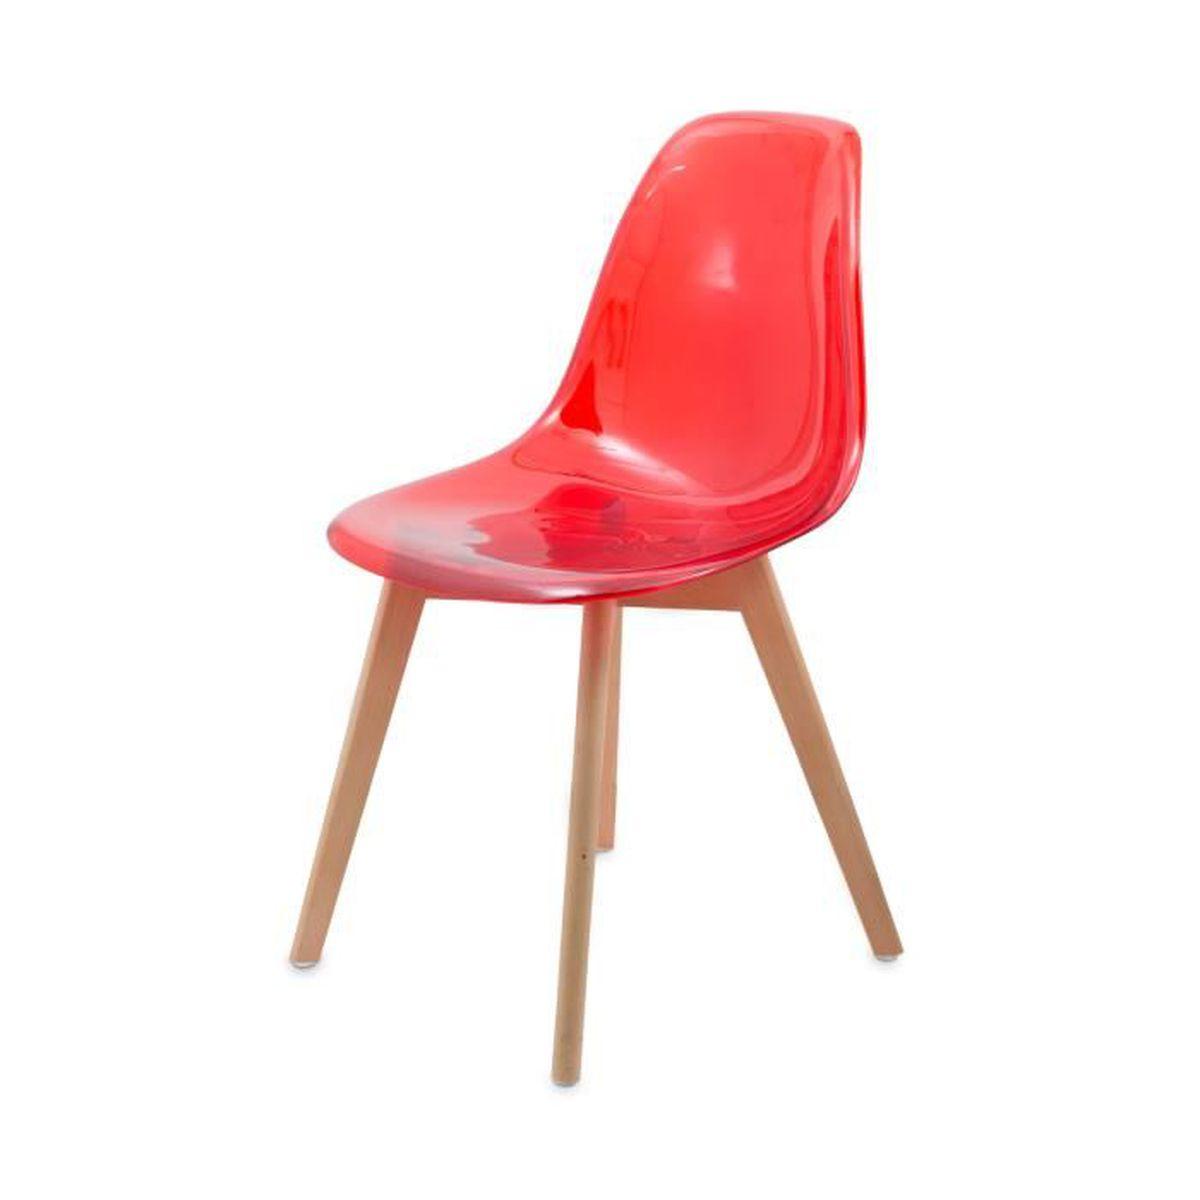 chaises plastique transparent. Black Bedroom Furniture Sets. Home Design Ideas